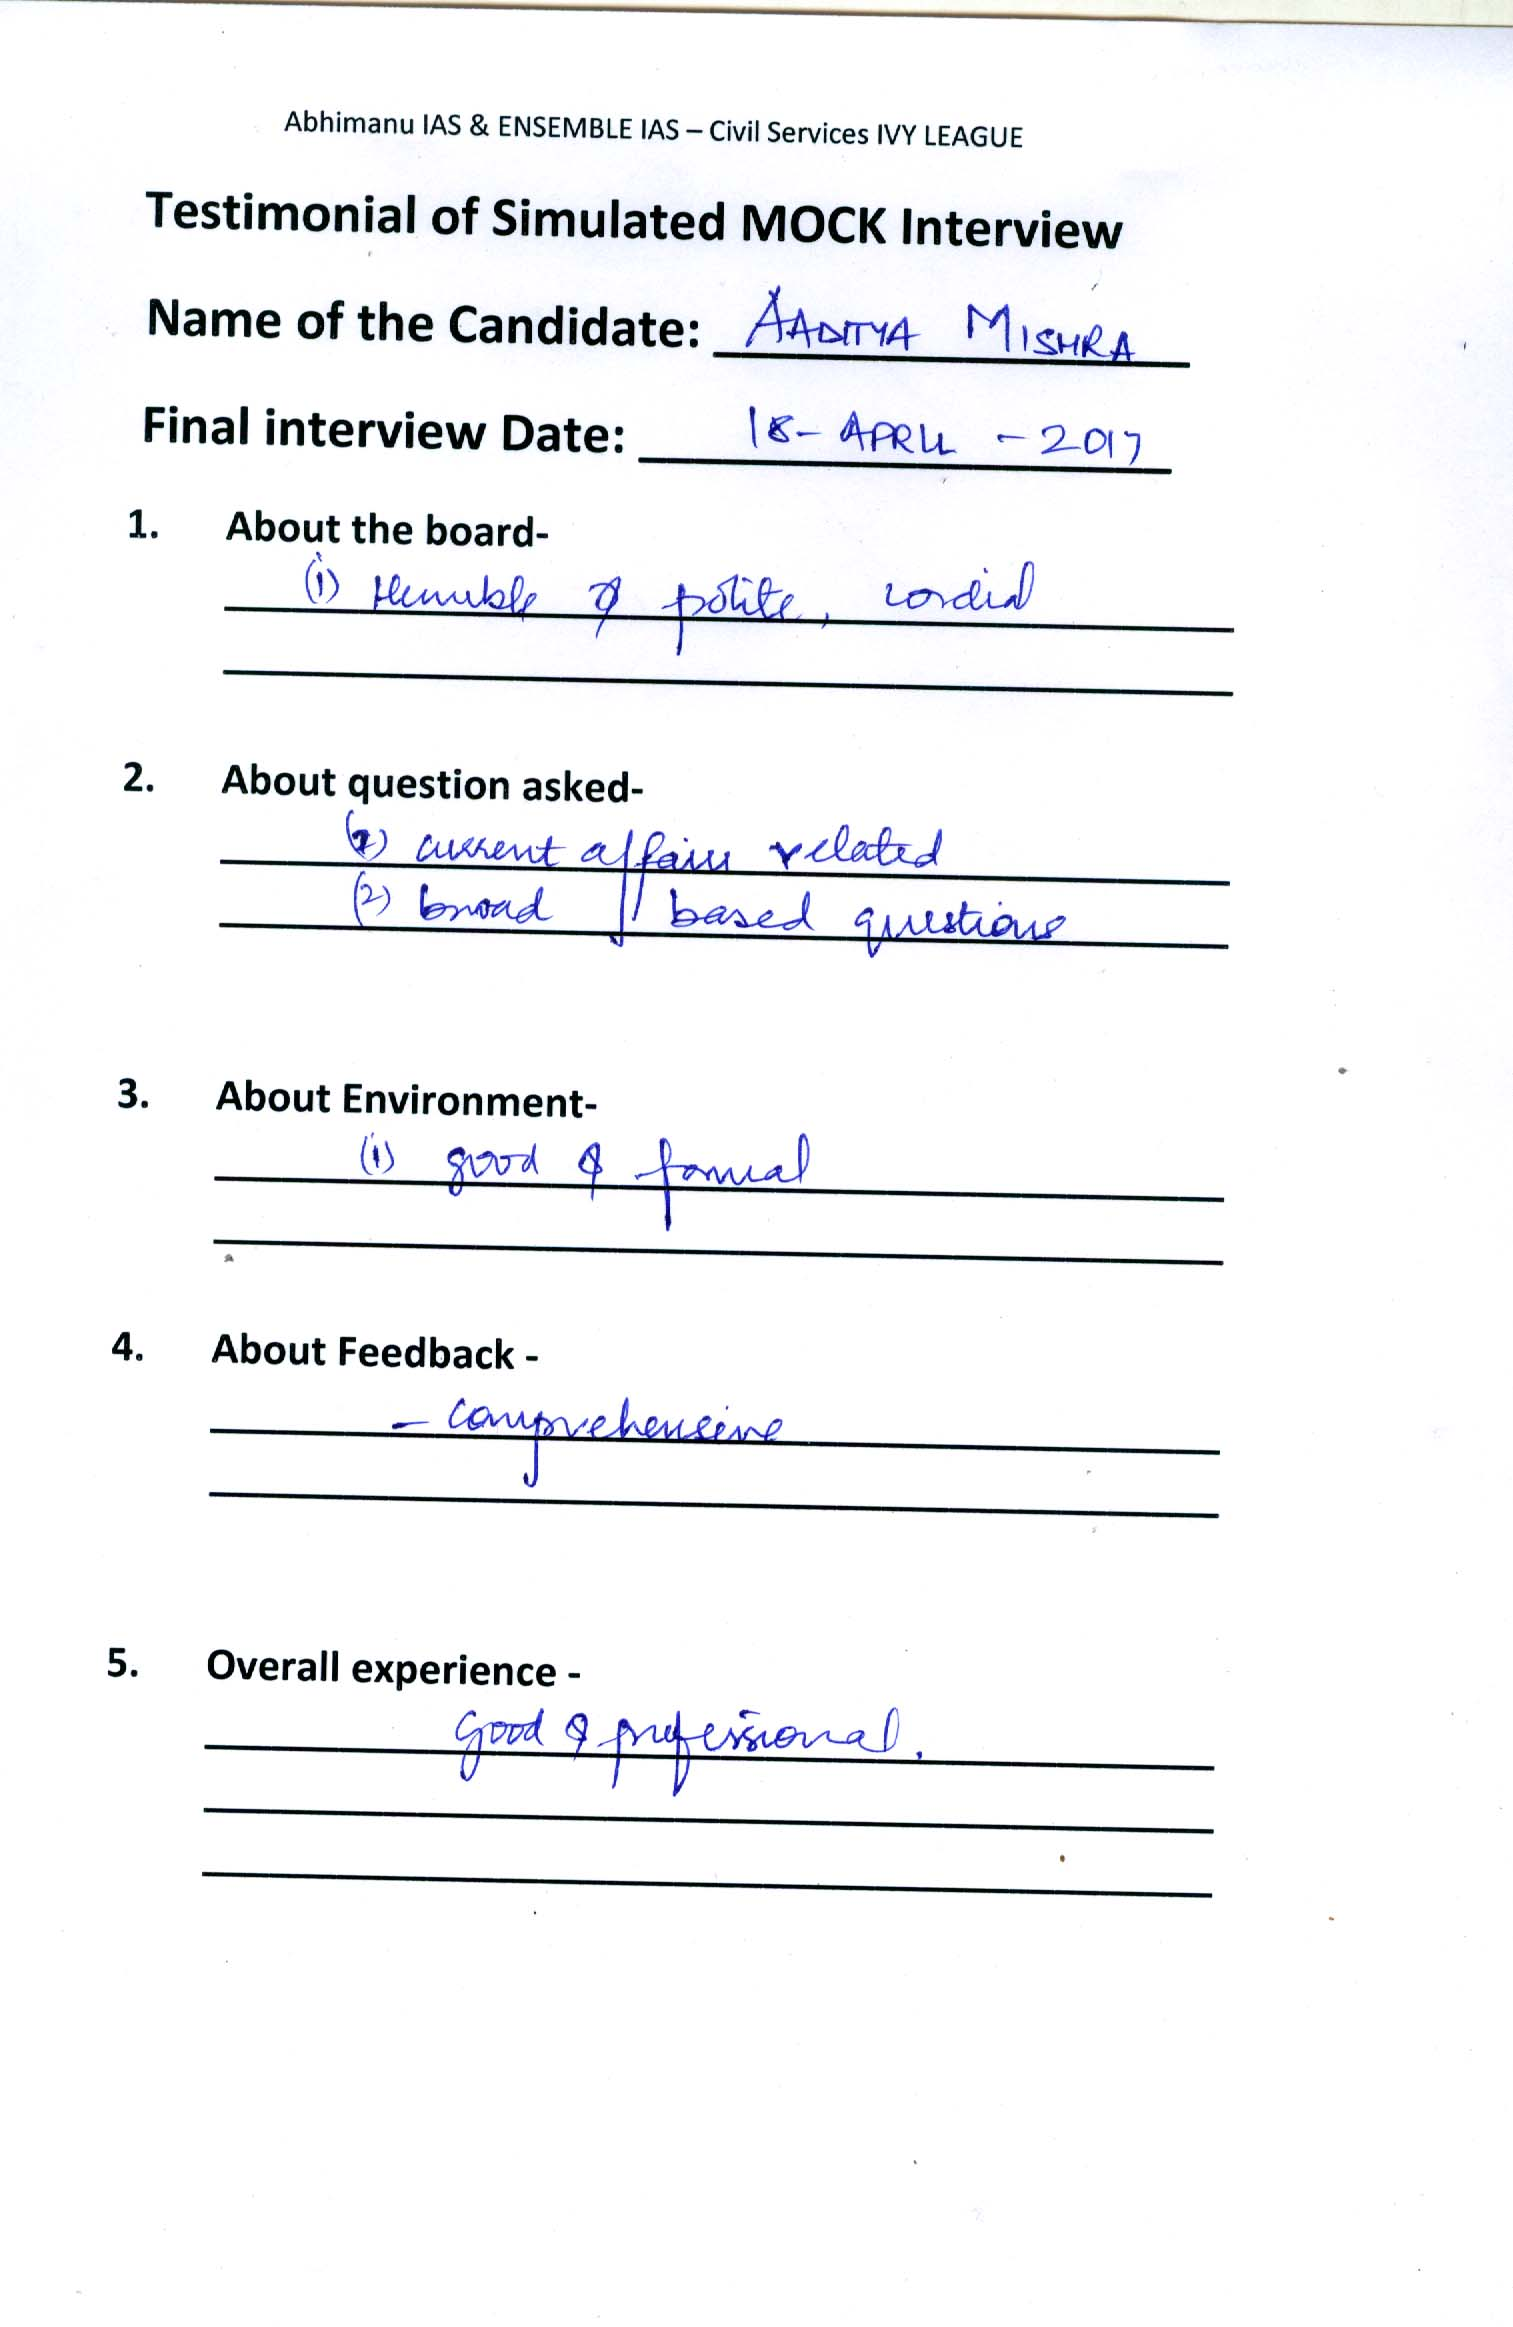 Interview Testimonial By- Additya Mishra